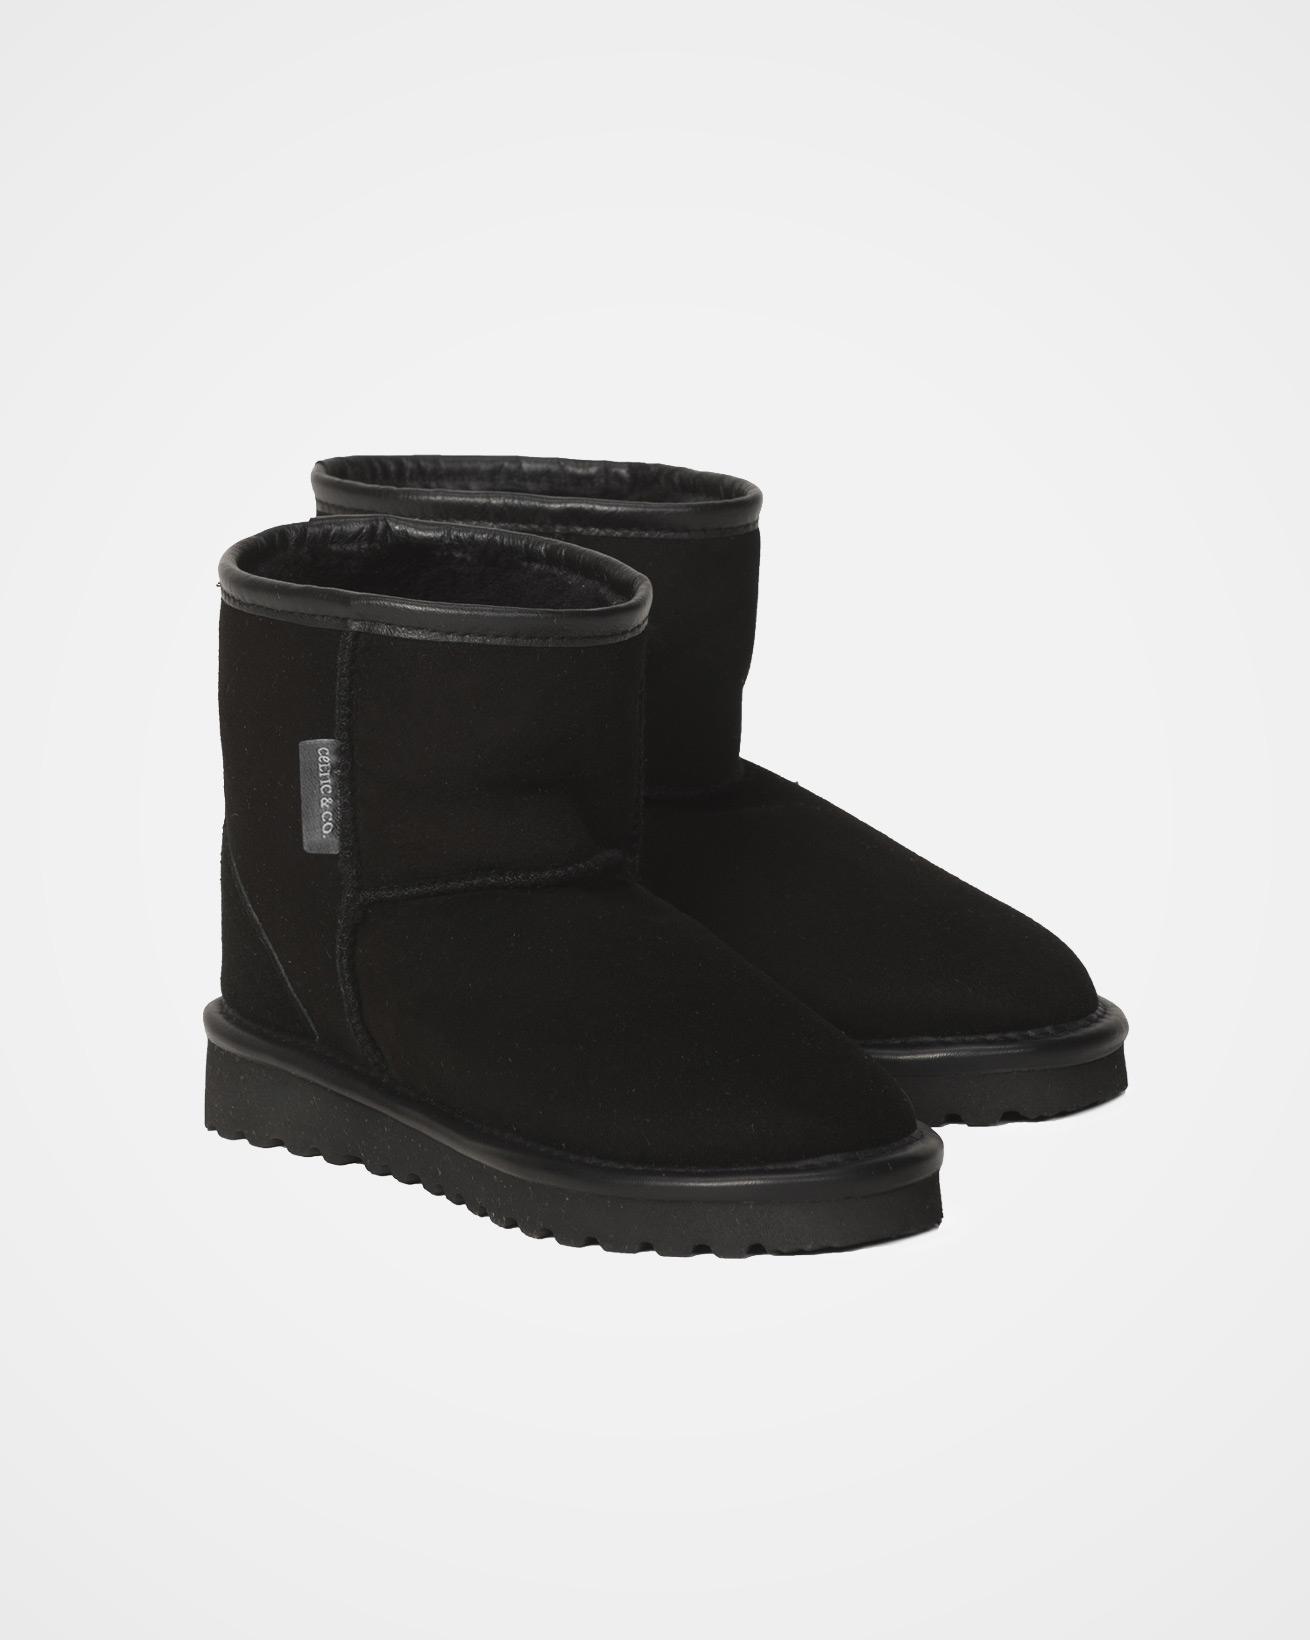 2037_classic-boots-shortie_black_pair.jpg